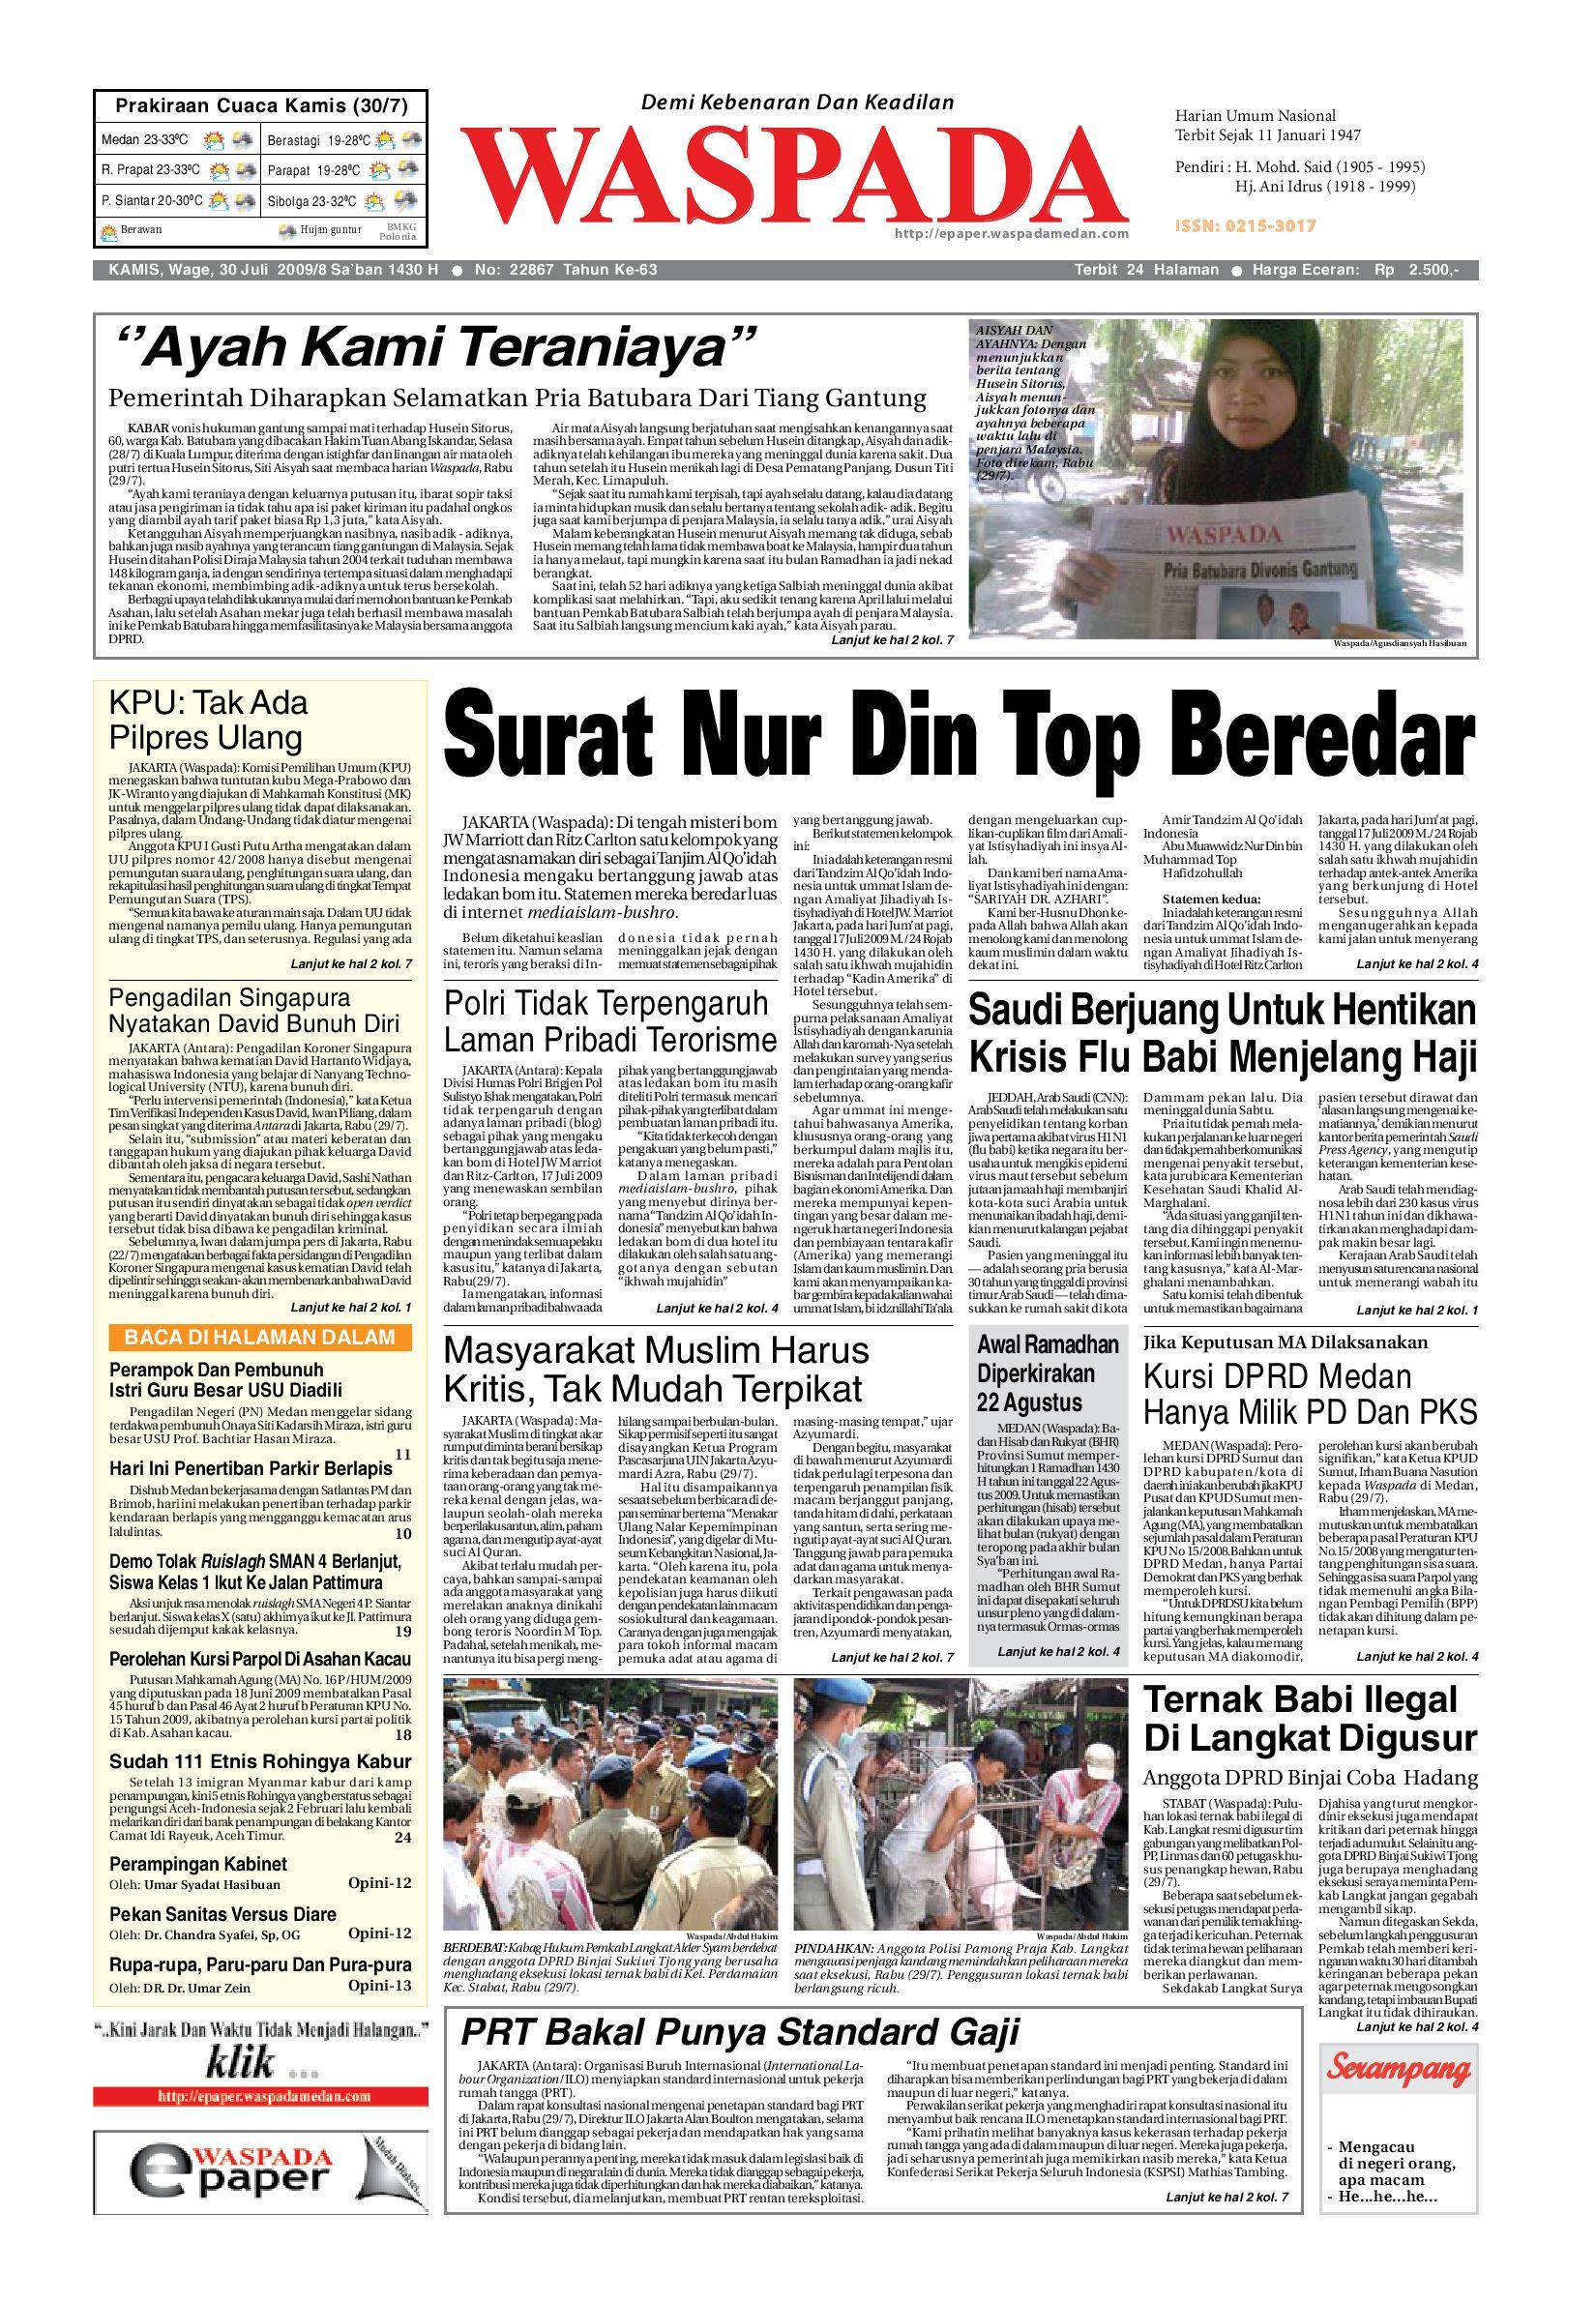 Waspada Kamis 30 Juli 2009 By Harian Issuu Charger Warna Warni Merk Hasan Sj0048